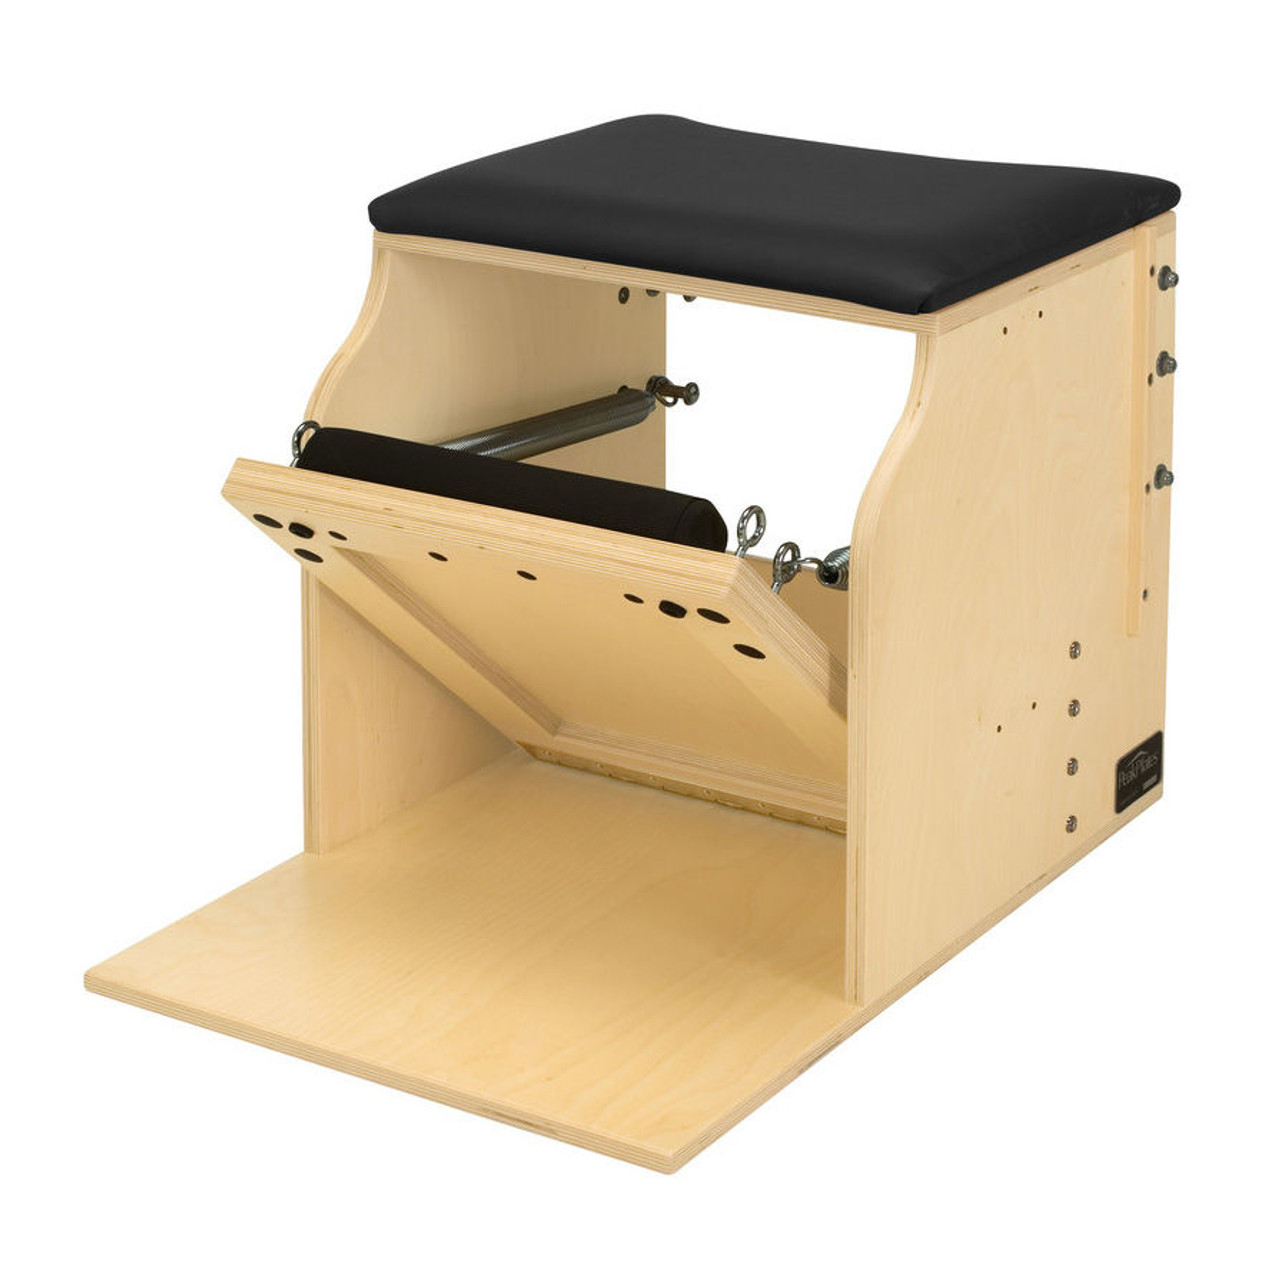 wunda chair accessories high rocking horse desk plans single pedal low peak pilates us en